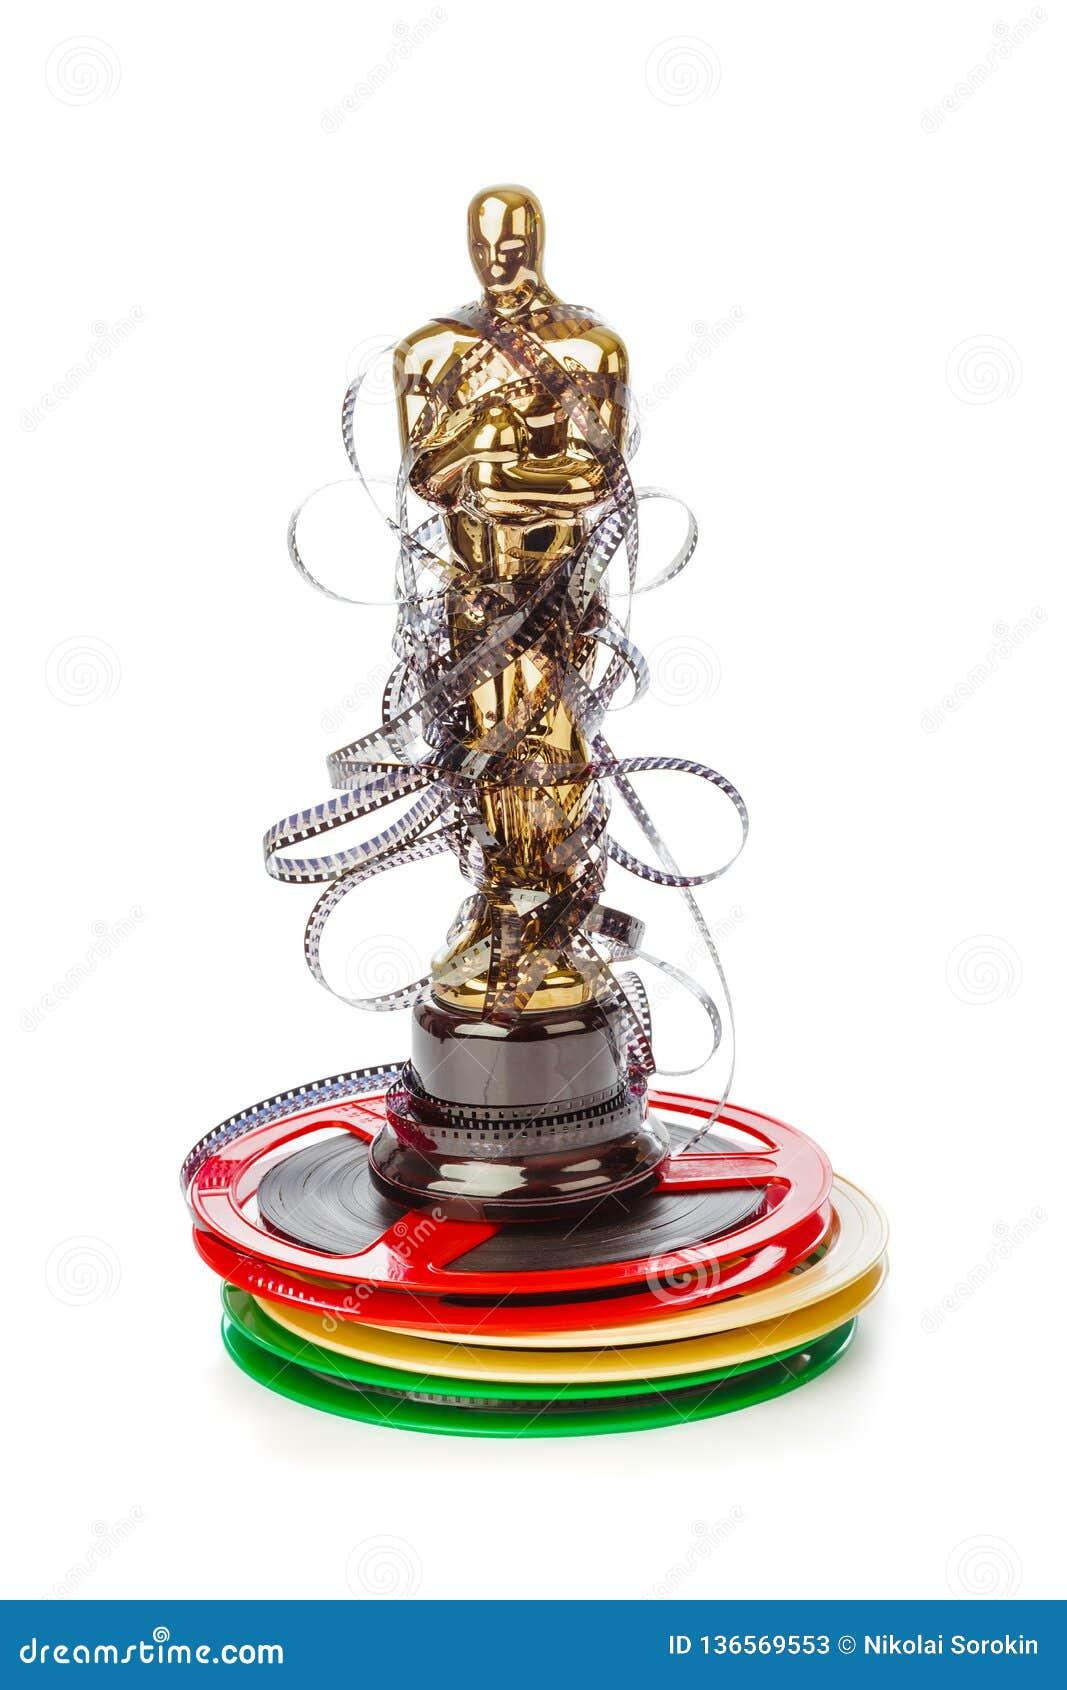 Award of Oscar ceremony and cinema film